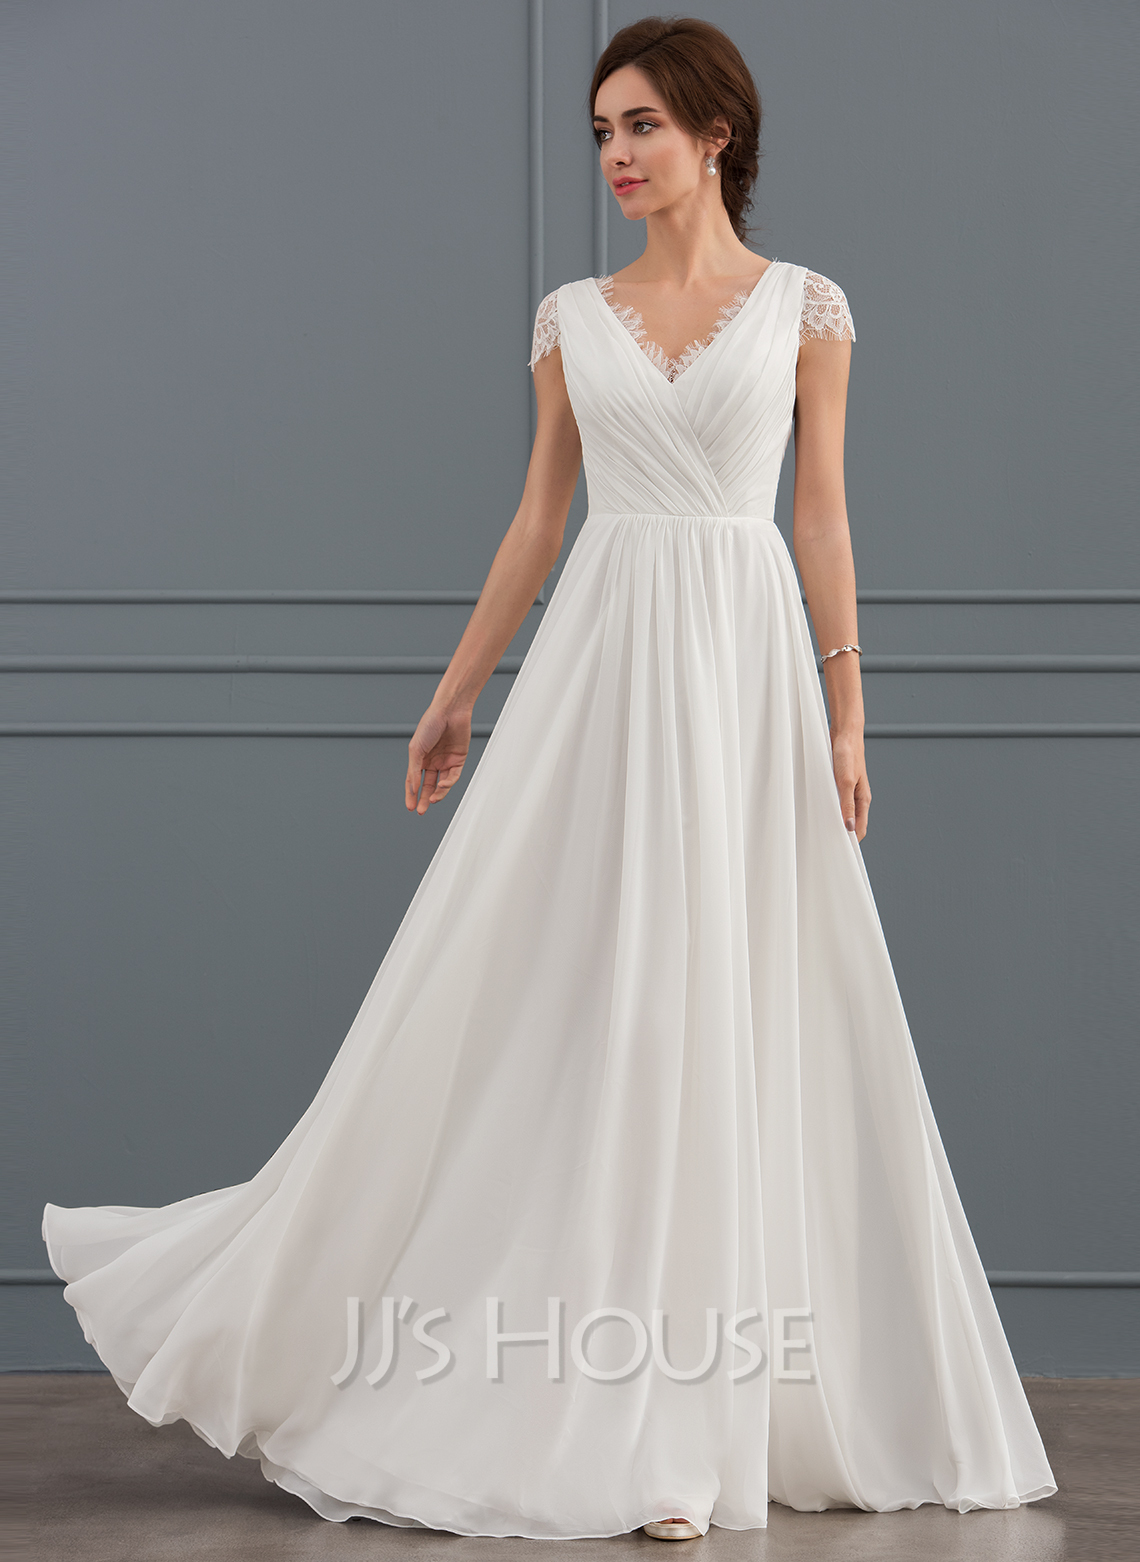 A-Line V-neck Floor-Length Chiffon Lace Wedding Dress With Ruffle